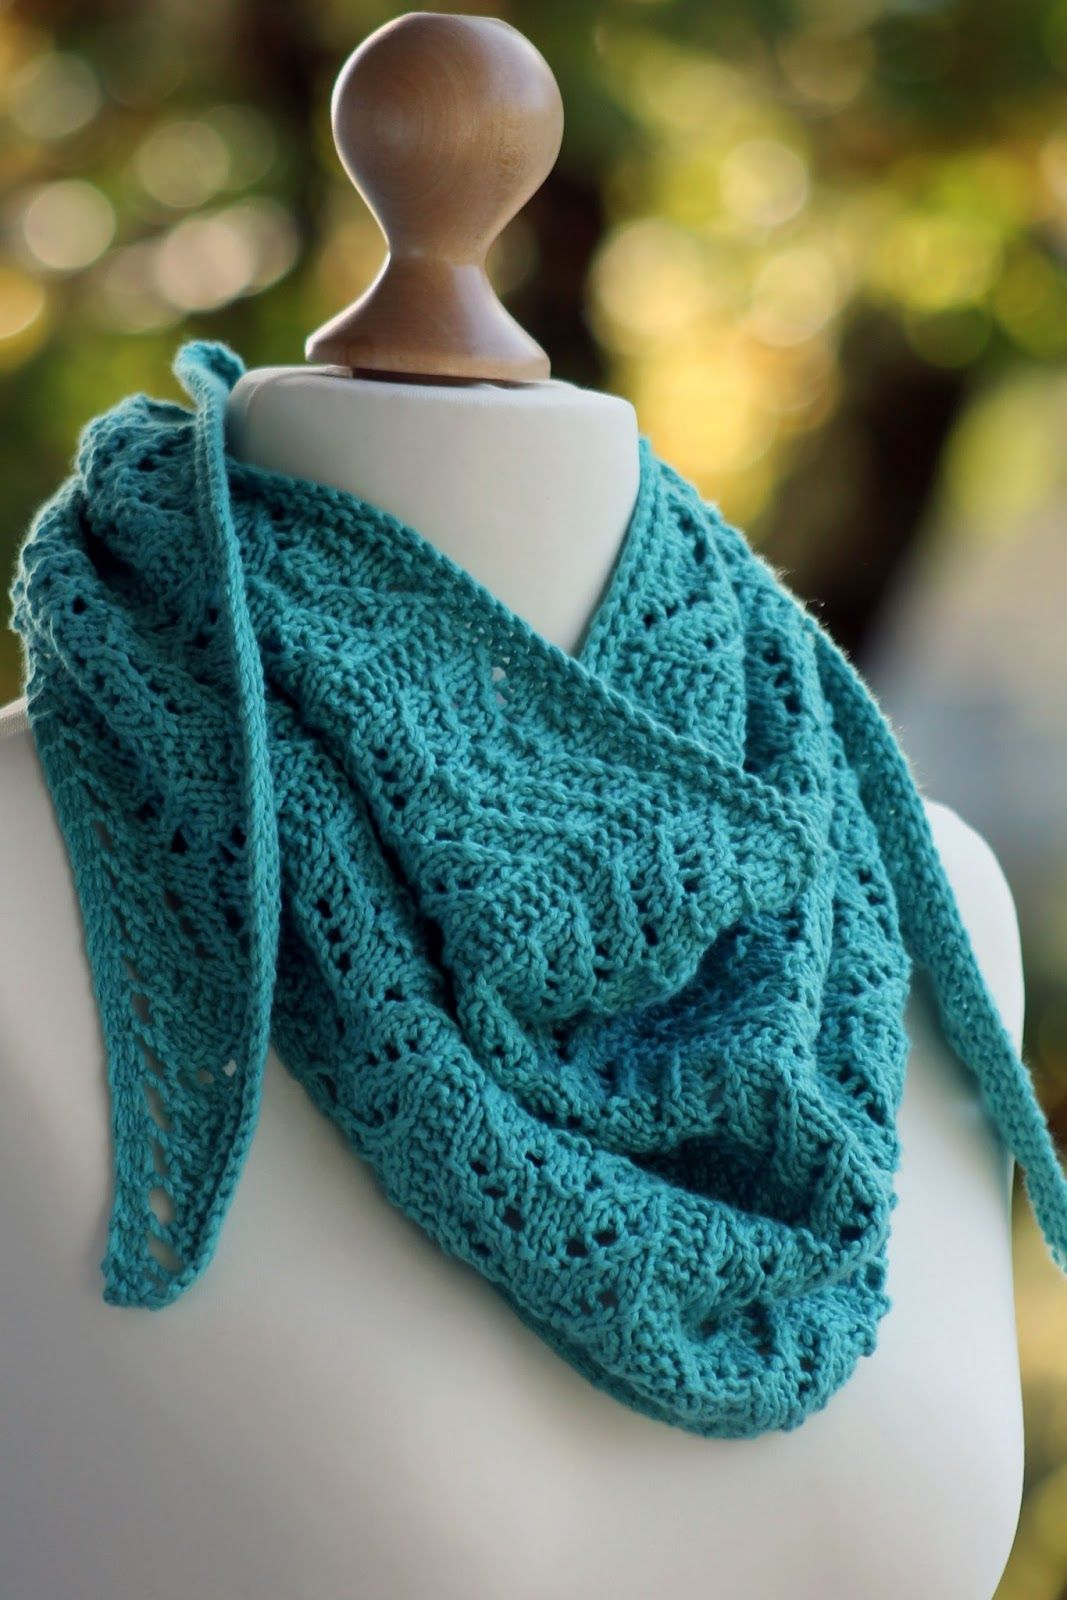 True Blue Shawlette | Knitting/crochet | Pinterest | Shawl, Knitting ...